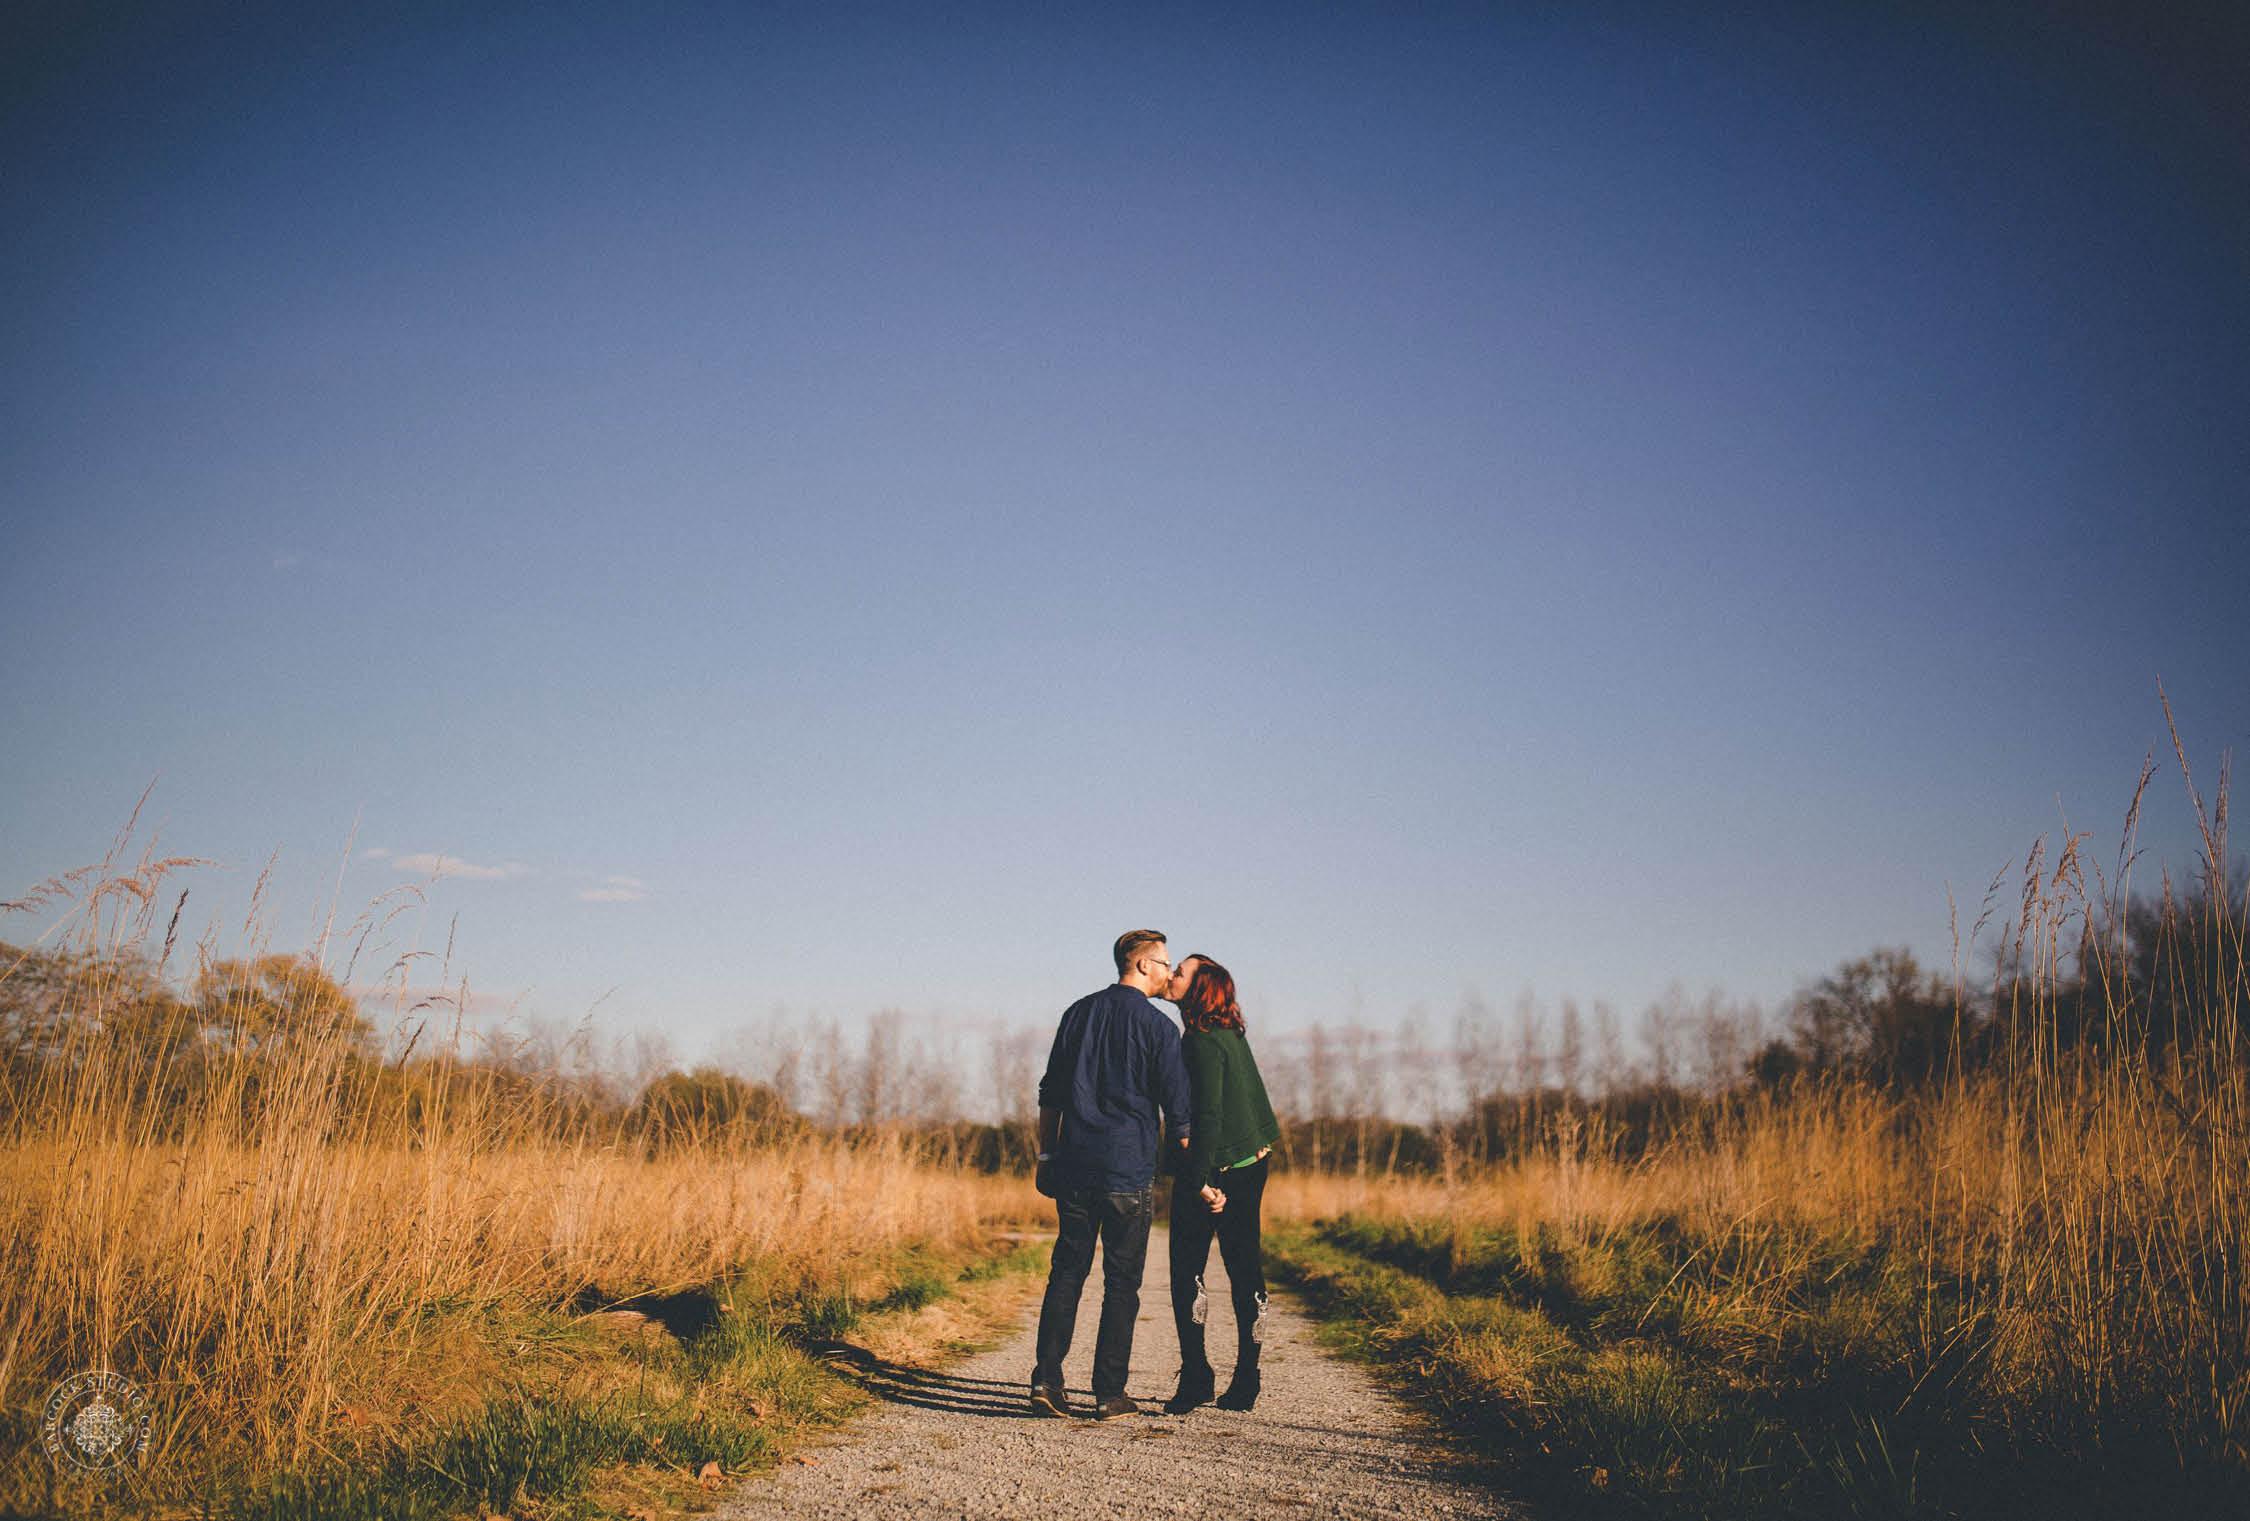 taylor-josh-engagement-photographer-dayton-ohio-8.jpg